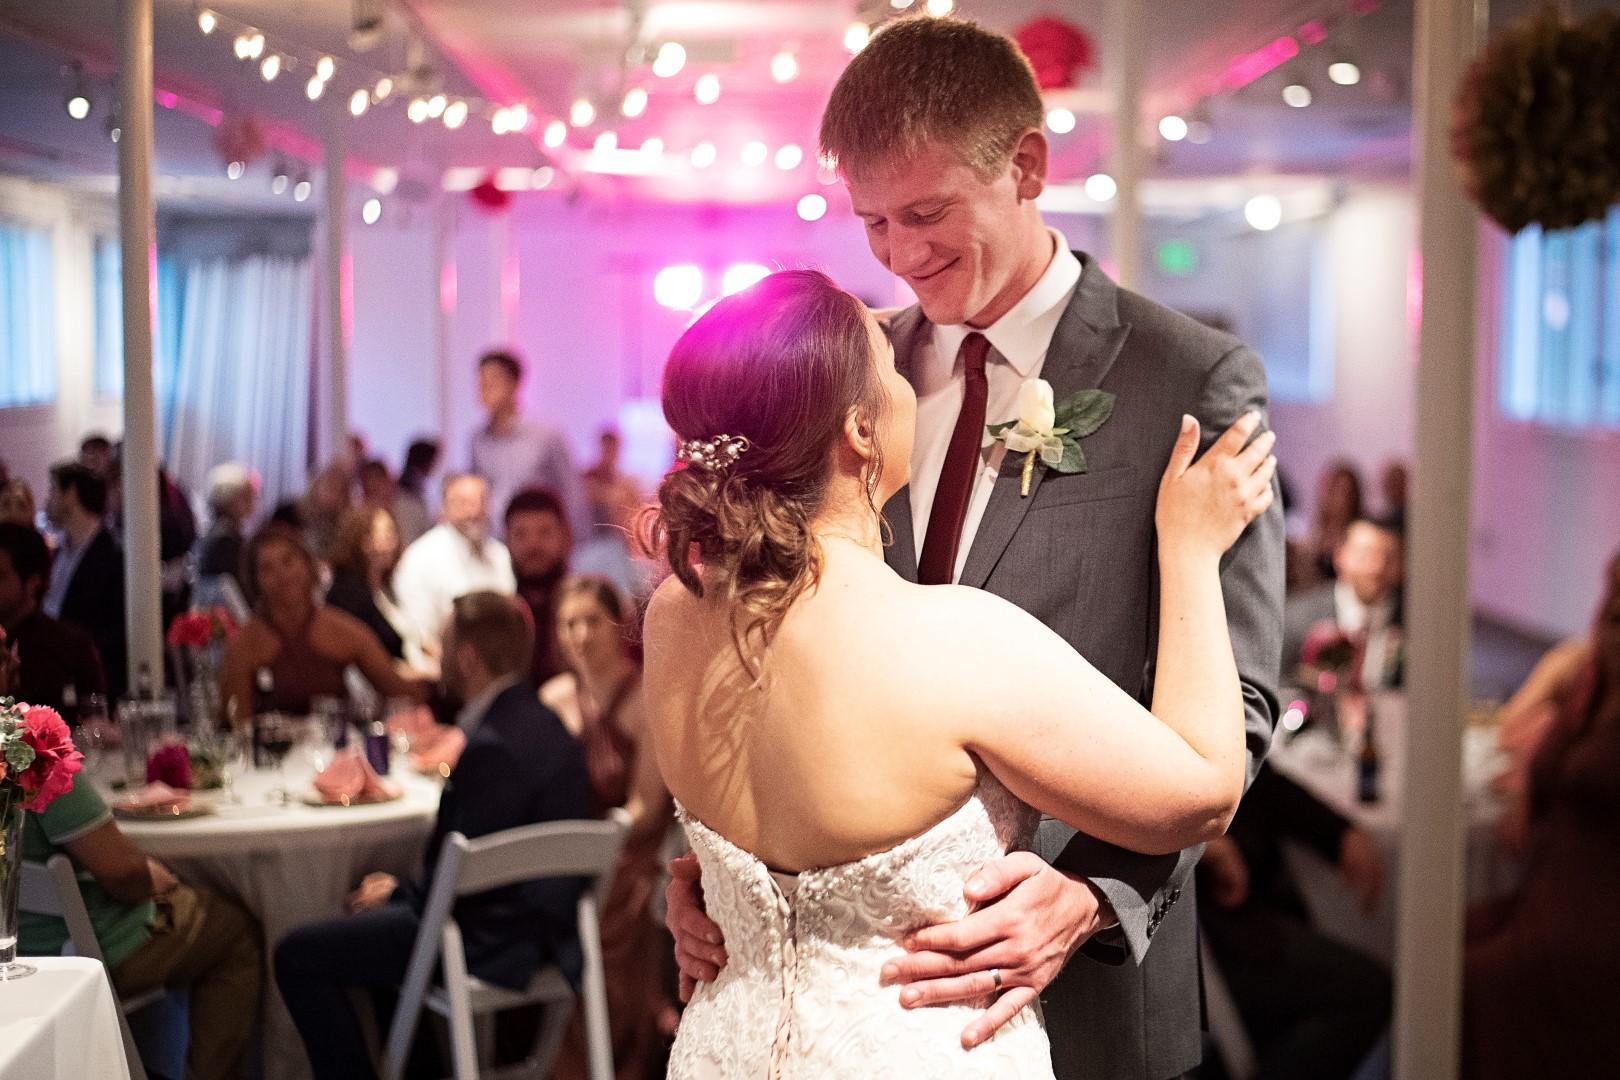 Courtney & Matt Dairy Barn Wedding May 2019_29 (Large).jpg